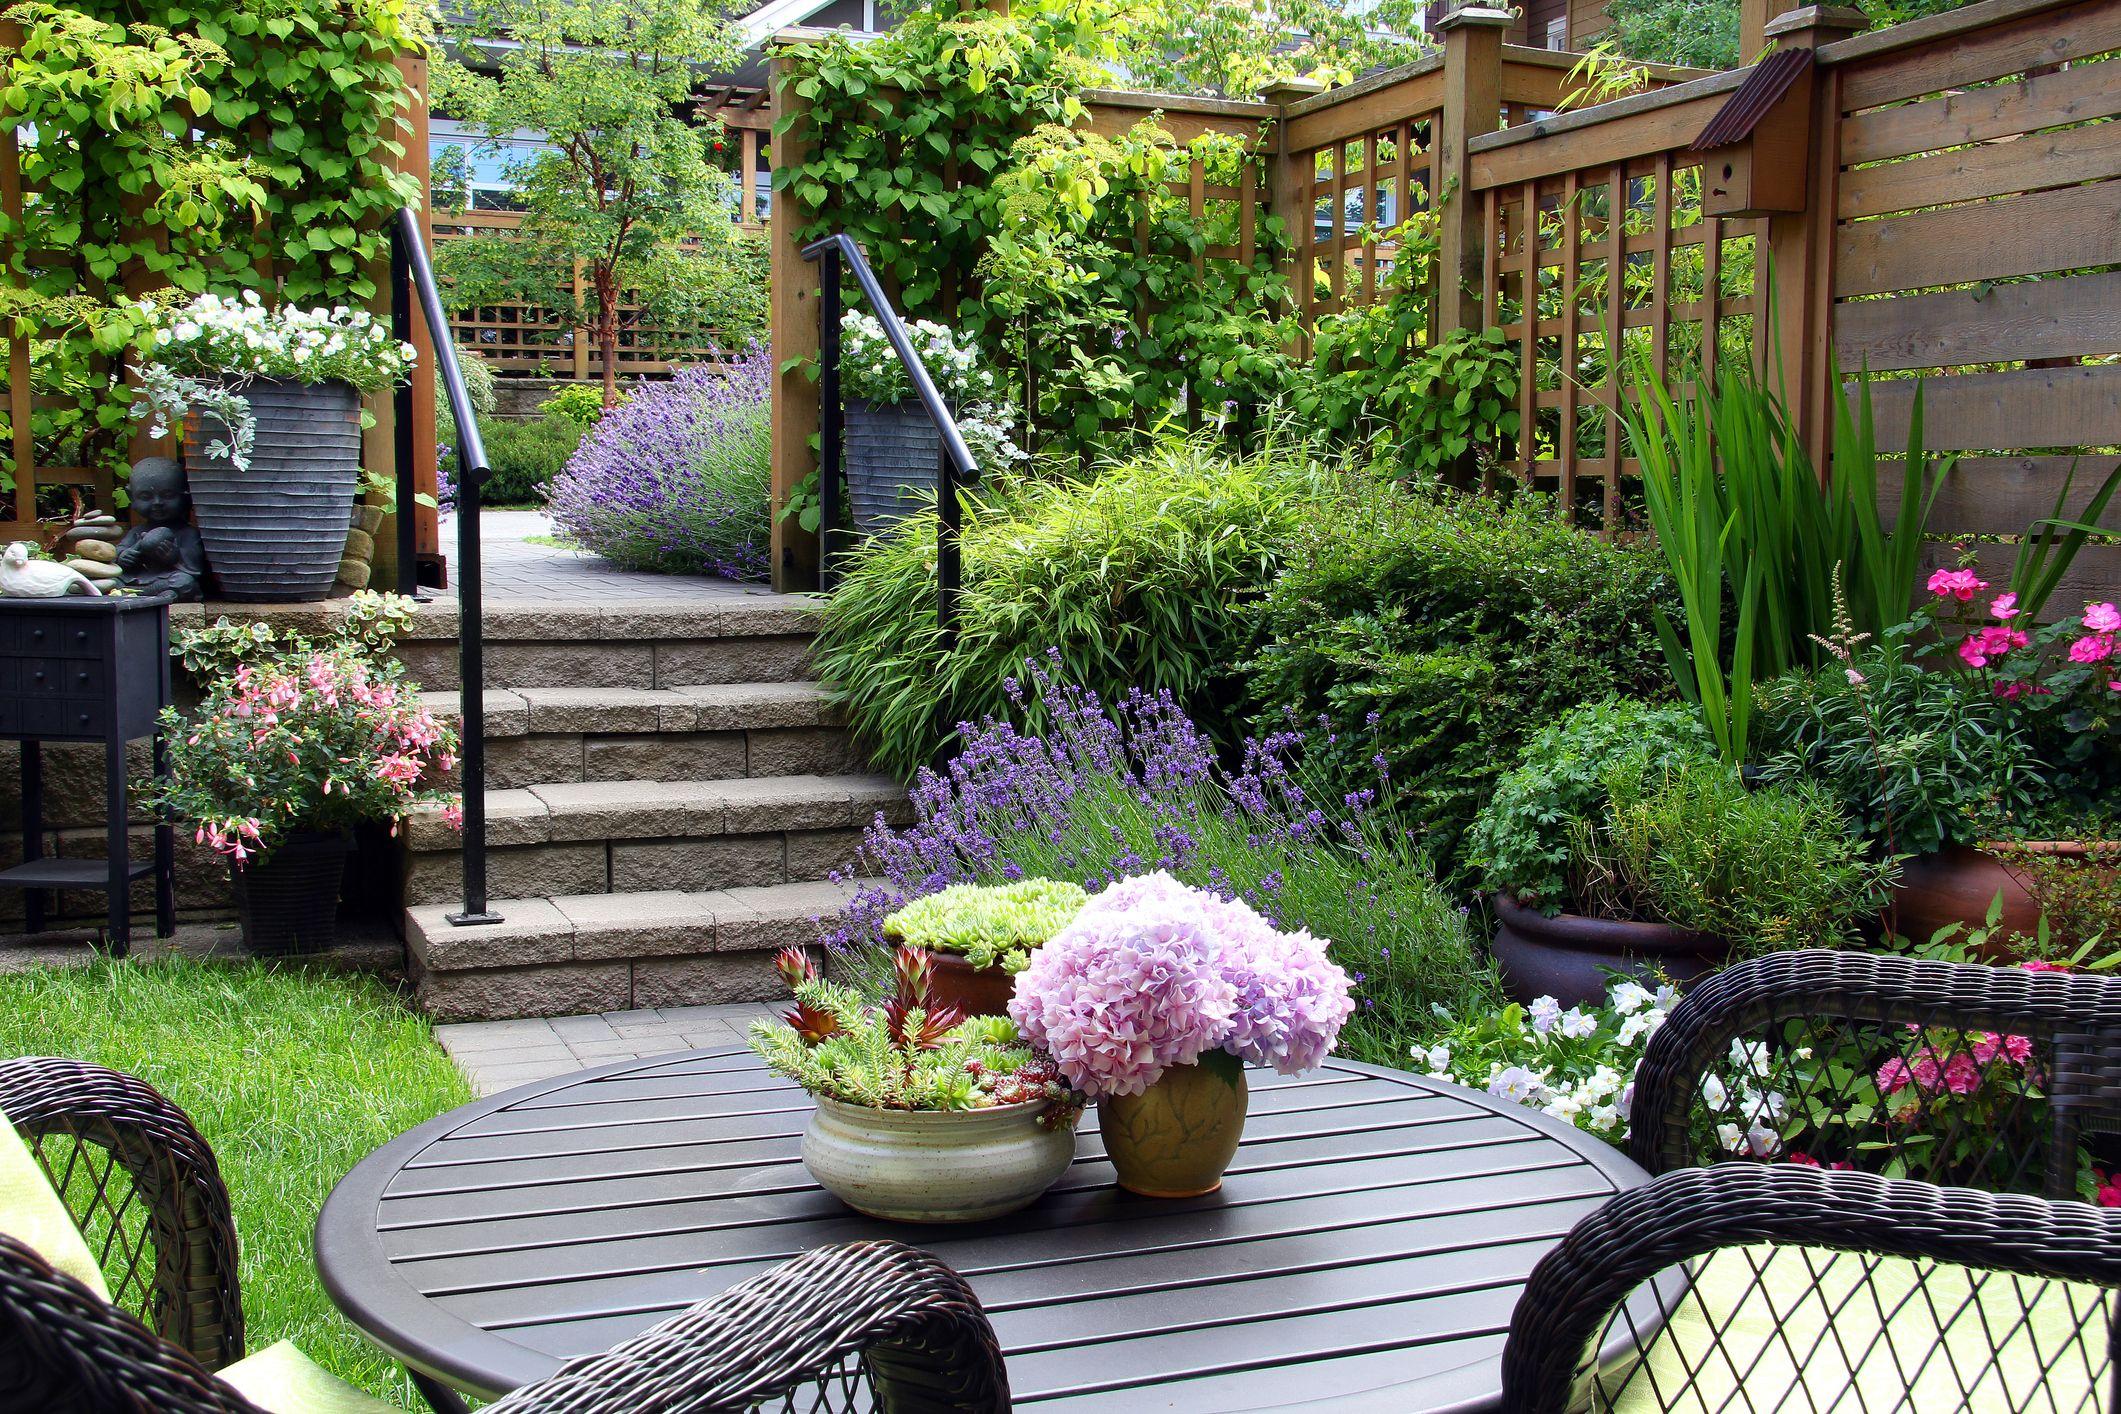 RHS Chelsea Flower Show's online garden competition returns for 2021